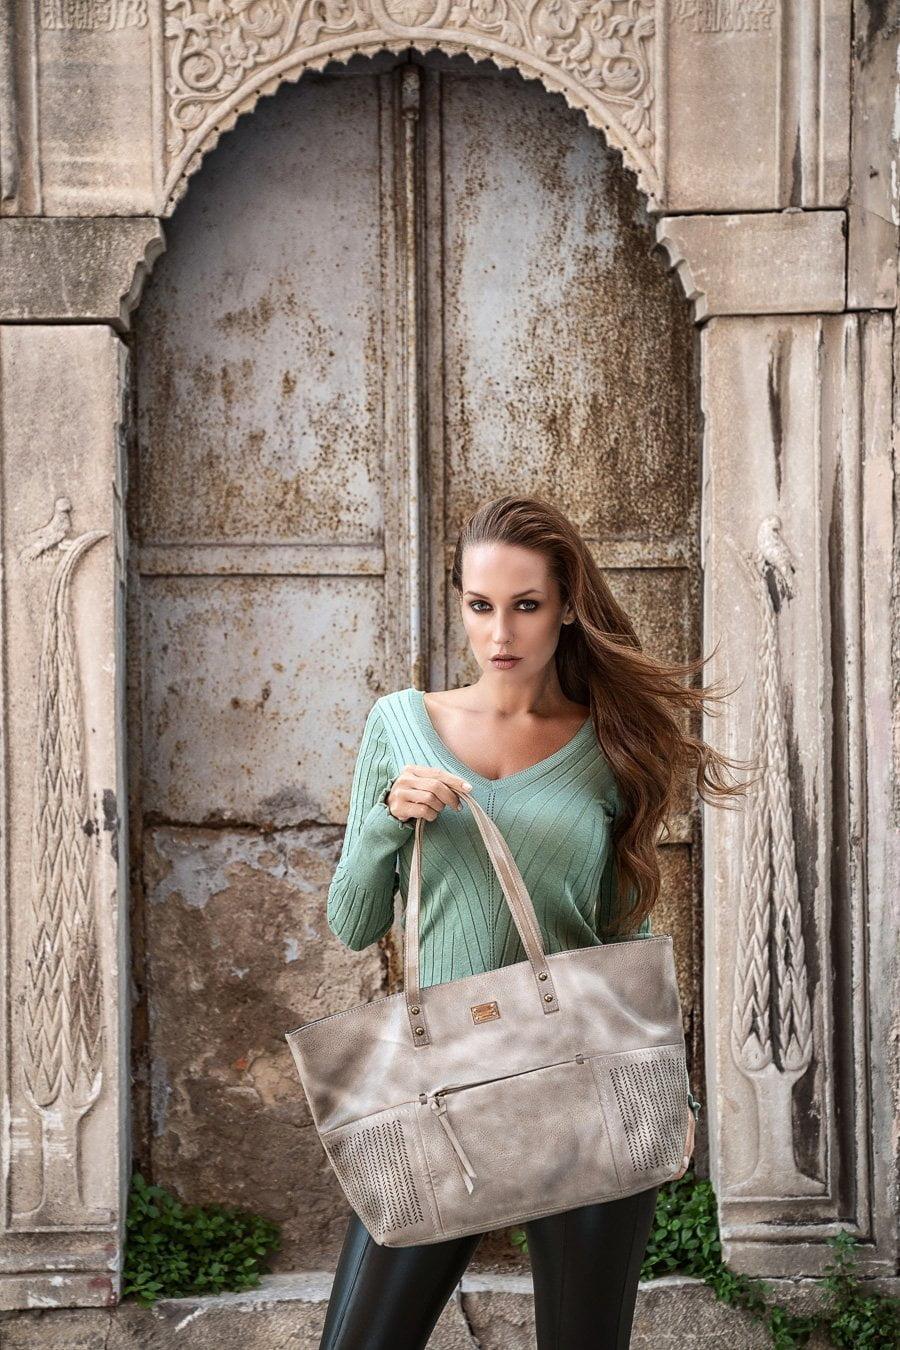 Moda Çekimi - Editorial - Beauty moda tekstil burakbulutfotografatolyesi 13